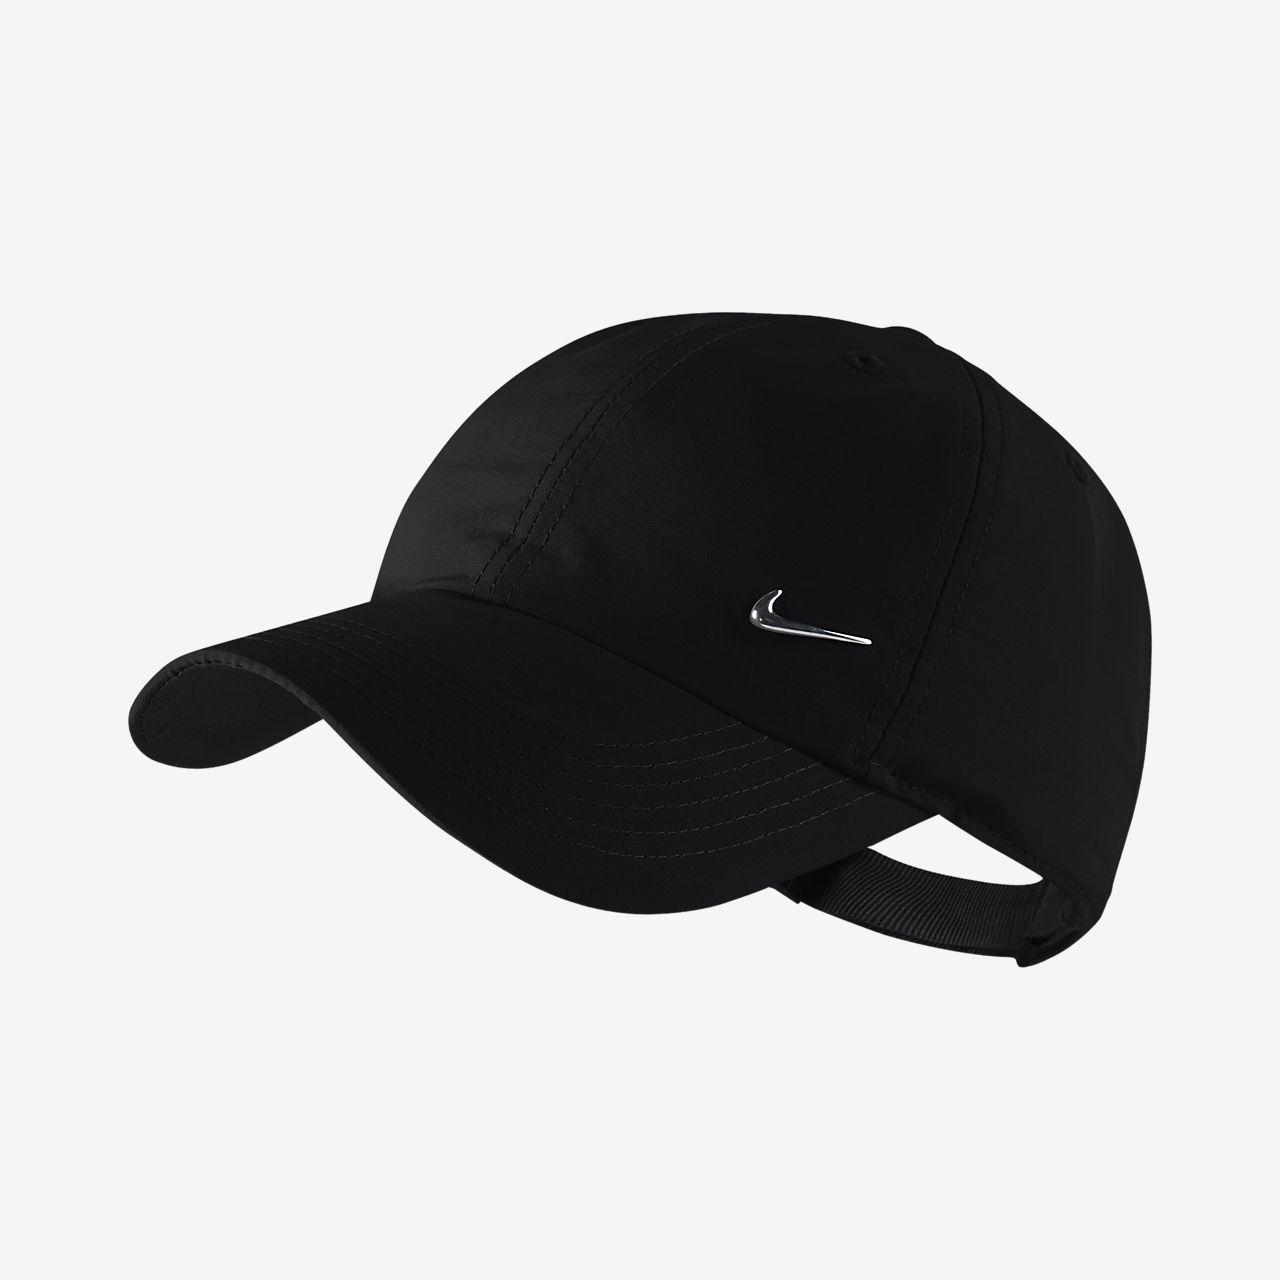 Nike Metal Swoosh-kasket (justerbar) til store børn